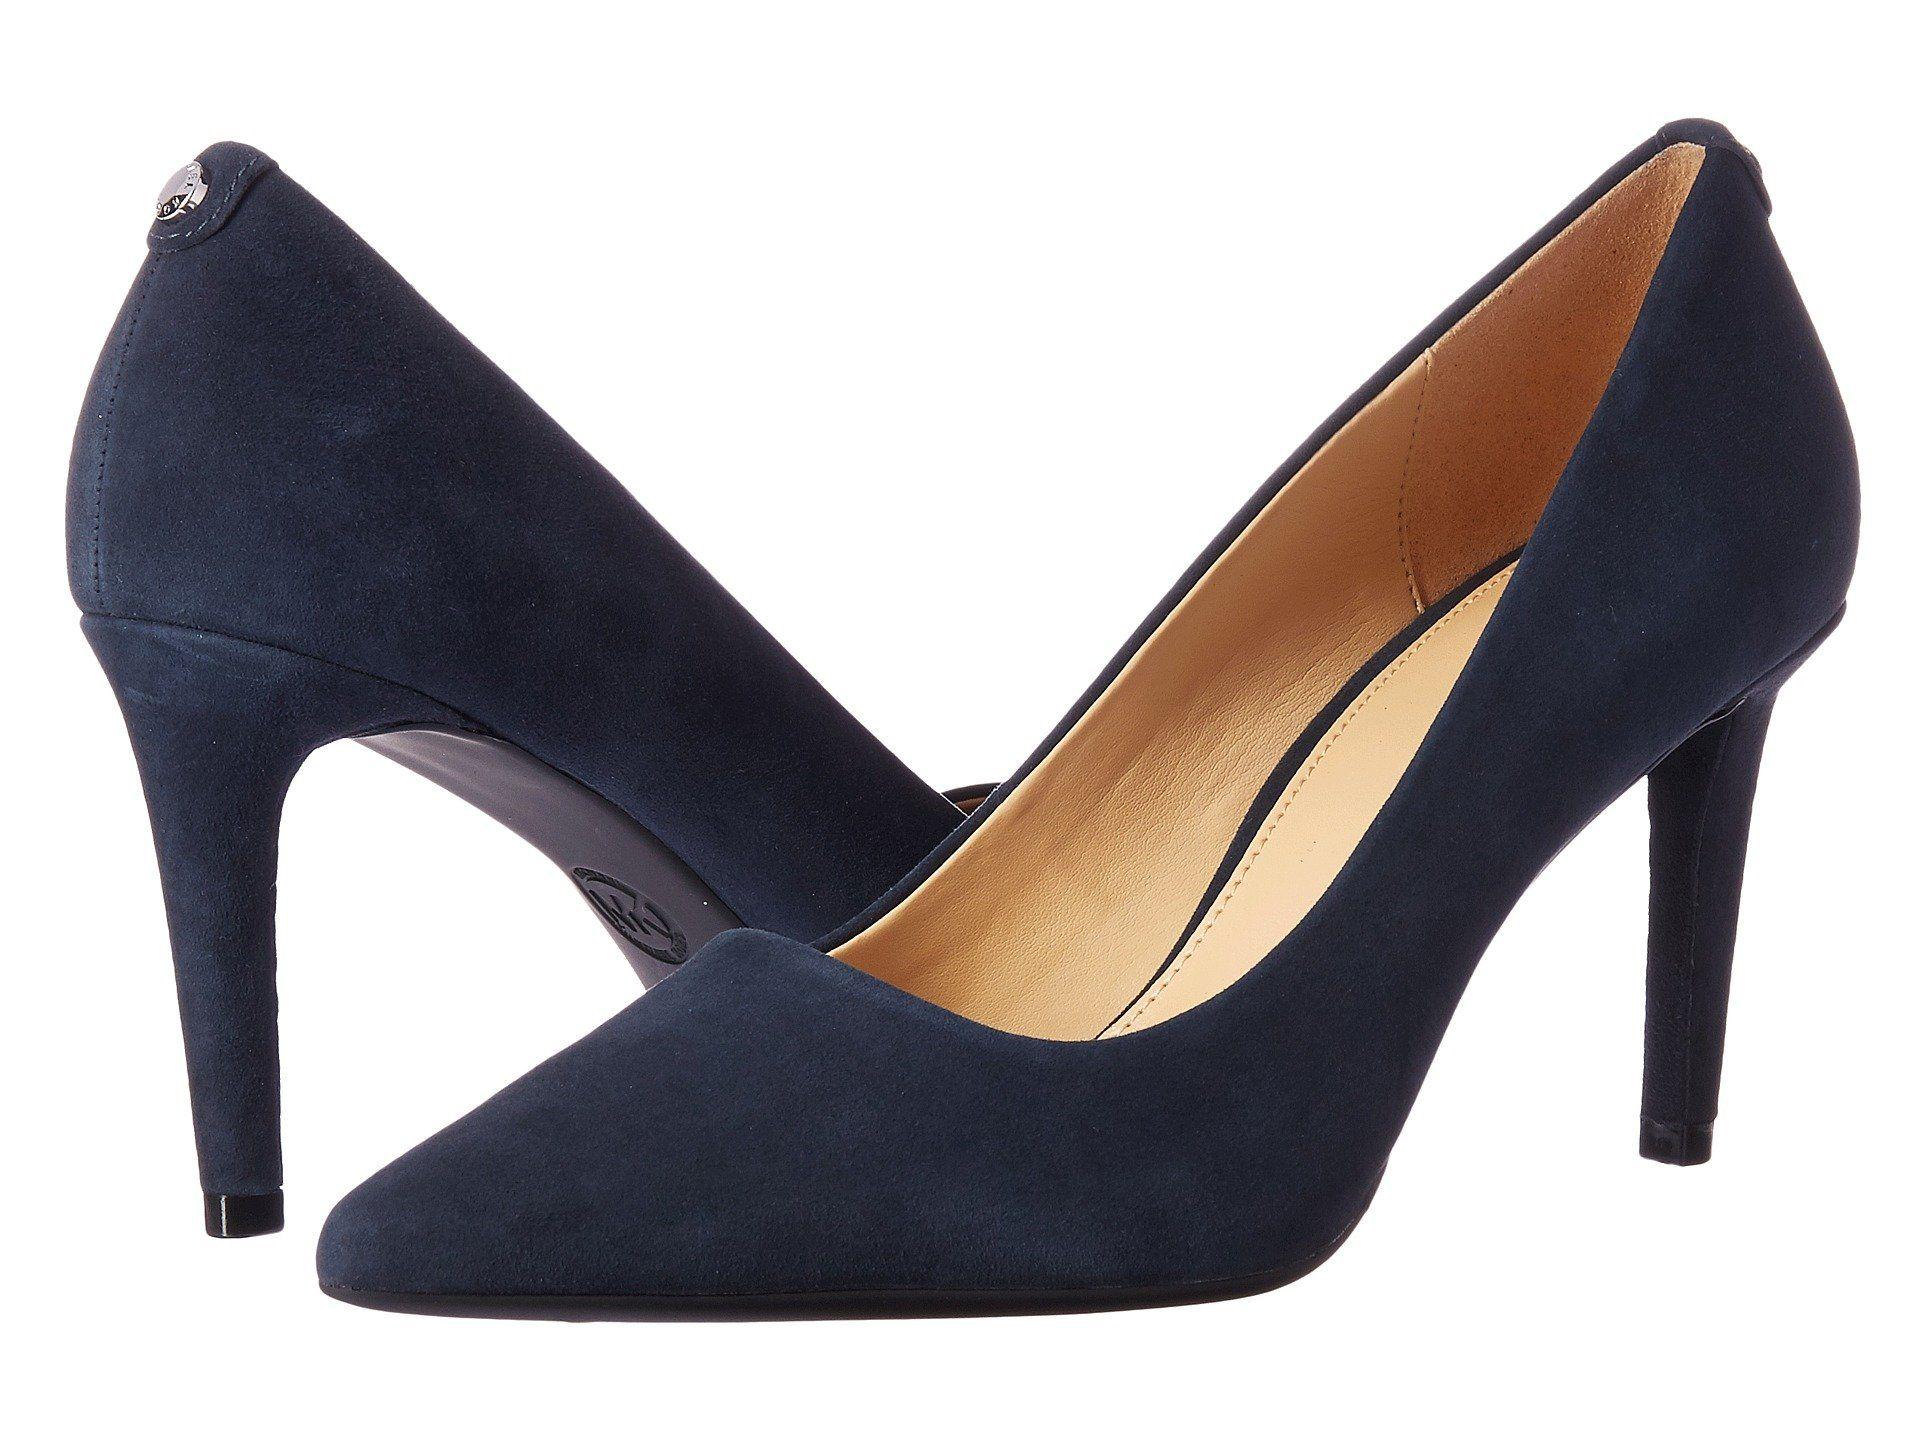 a57a340861a3 MICHAEL MICHAEL KORS Dorothy Flex Pump.  michaelmichaelkors  shoes